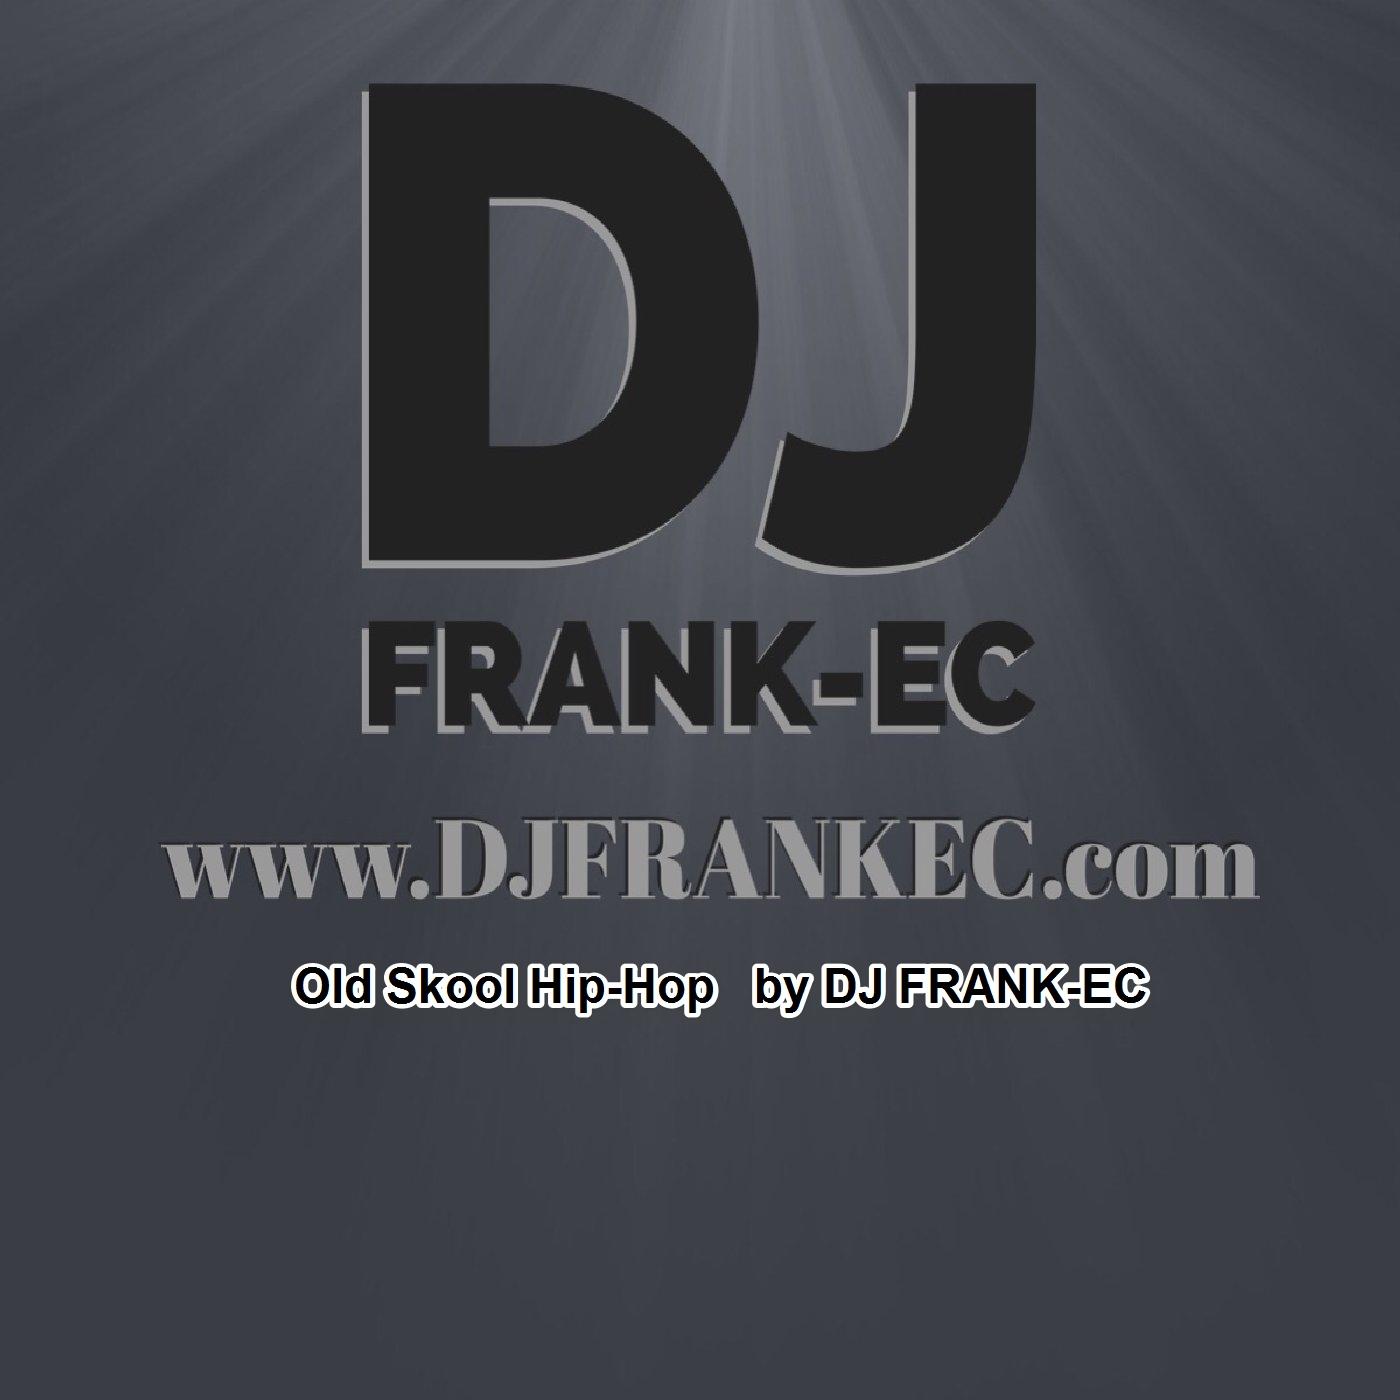 Old Skool Hip-Hop - DJ Frank-EC